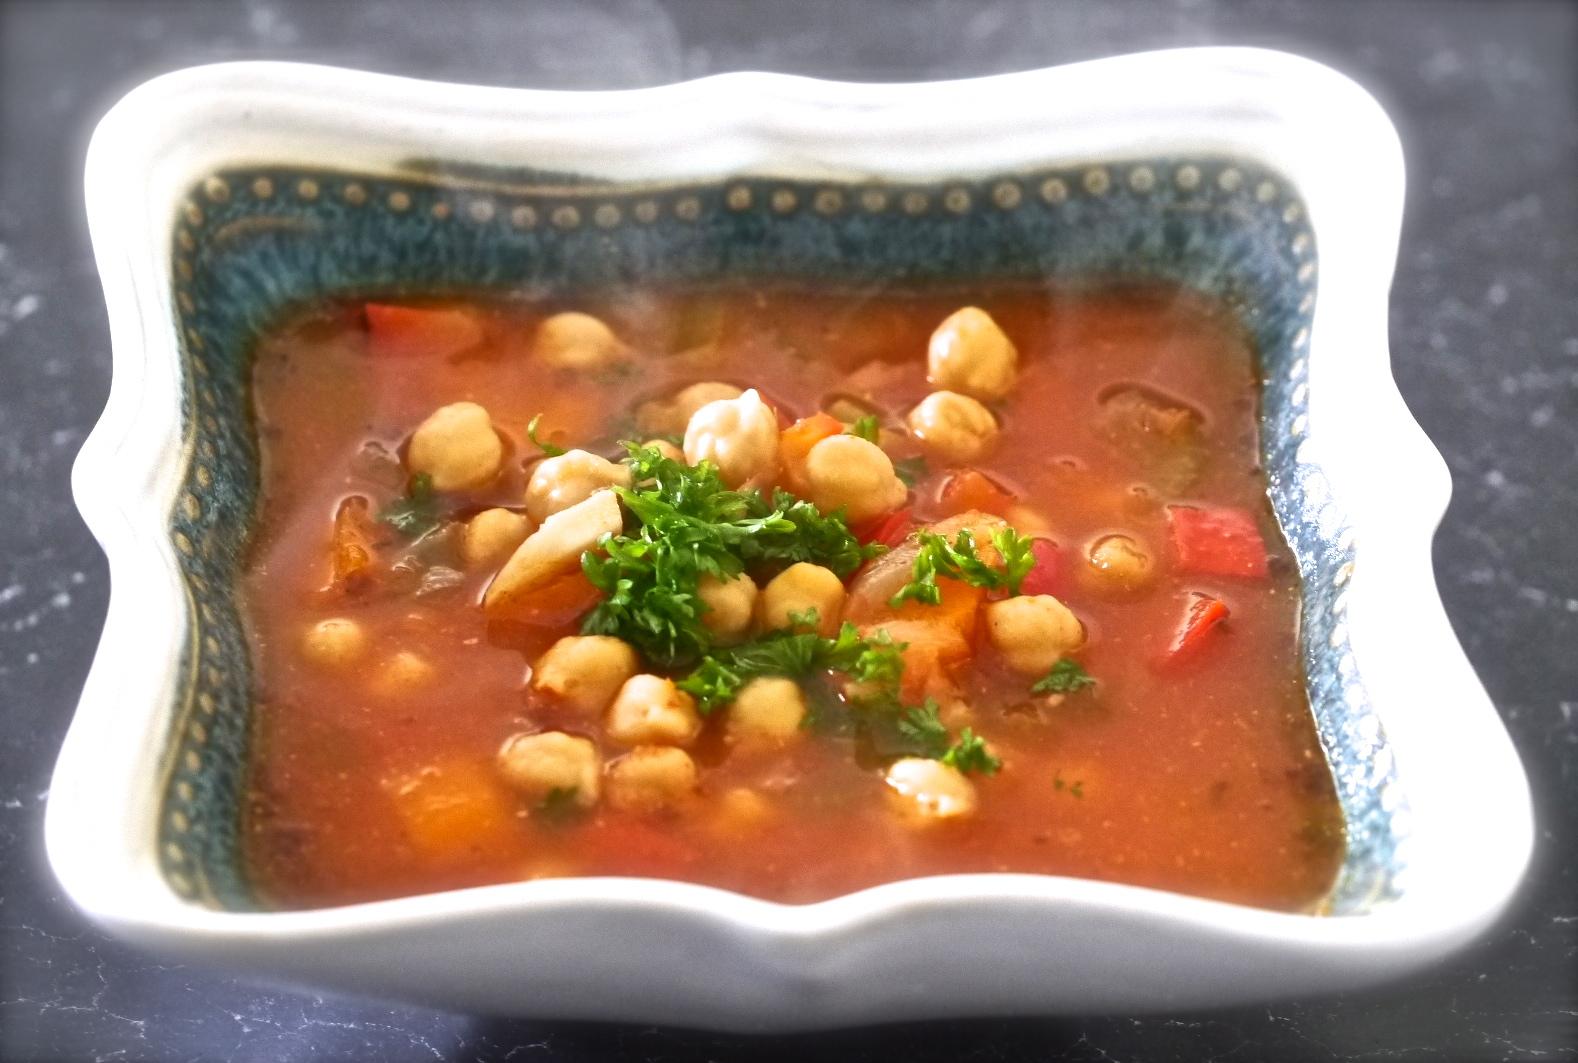 Cuban Vegetarian Garbanzo Bean Soup